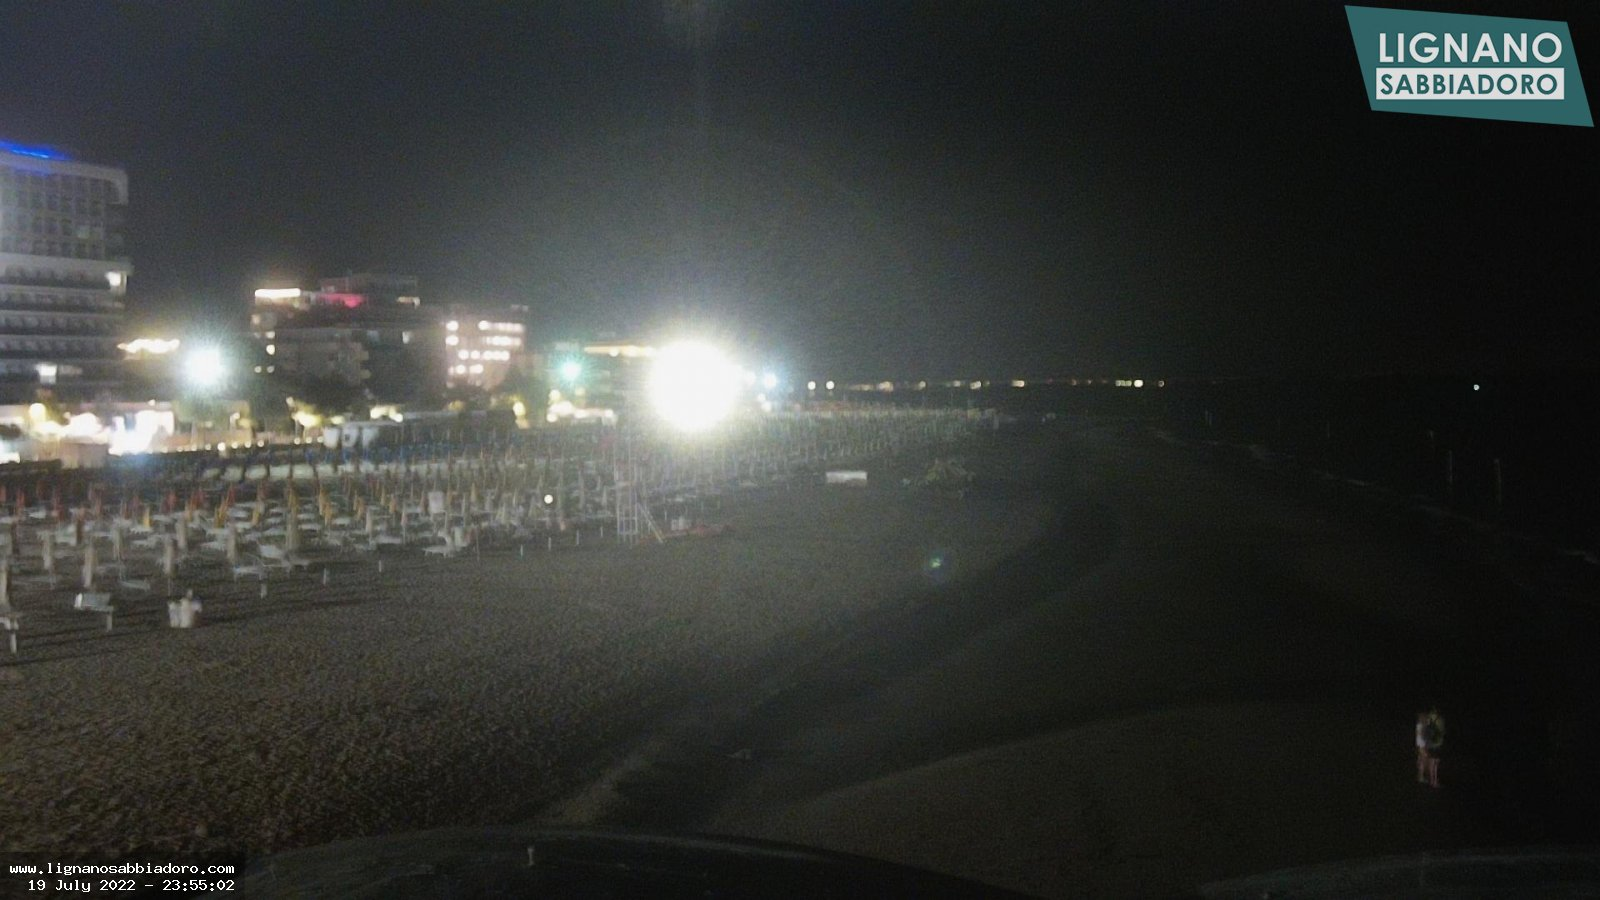 Webcam in Lignano Sabbiadoro, Blick auf VIP Pavillons im Strand